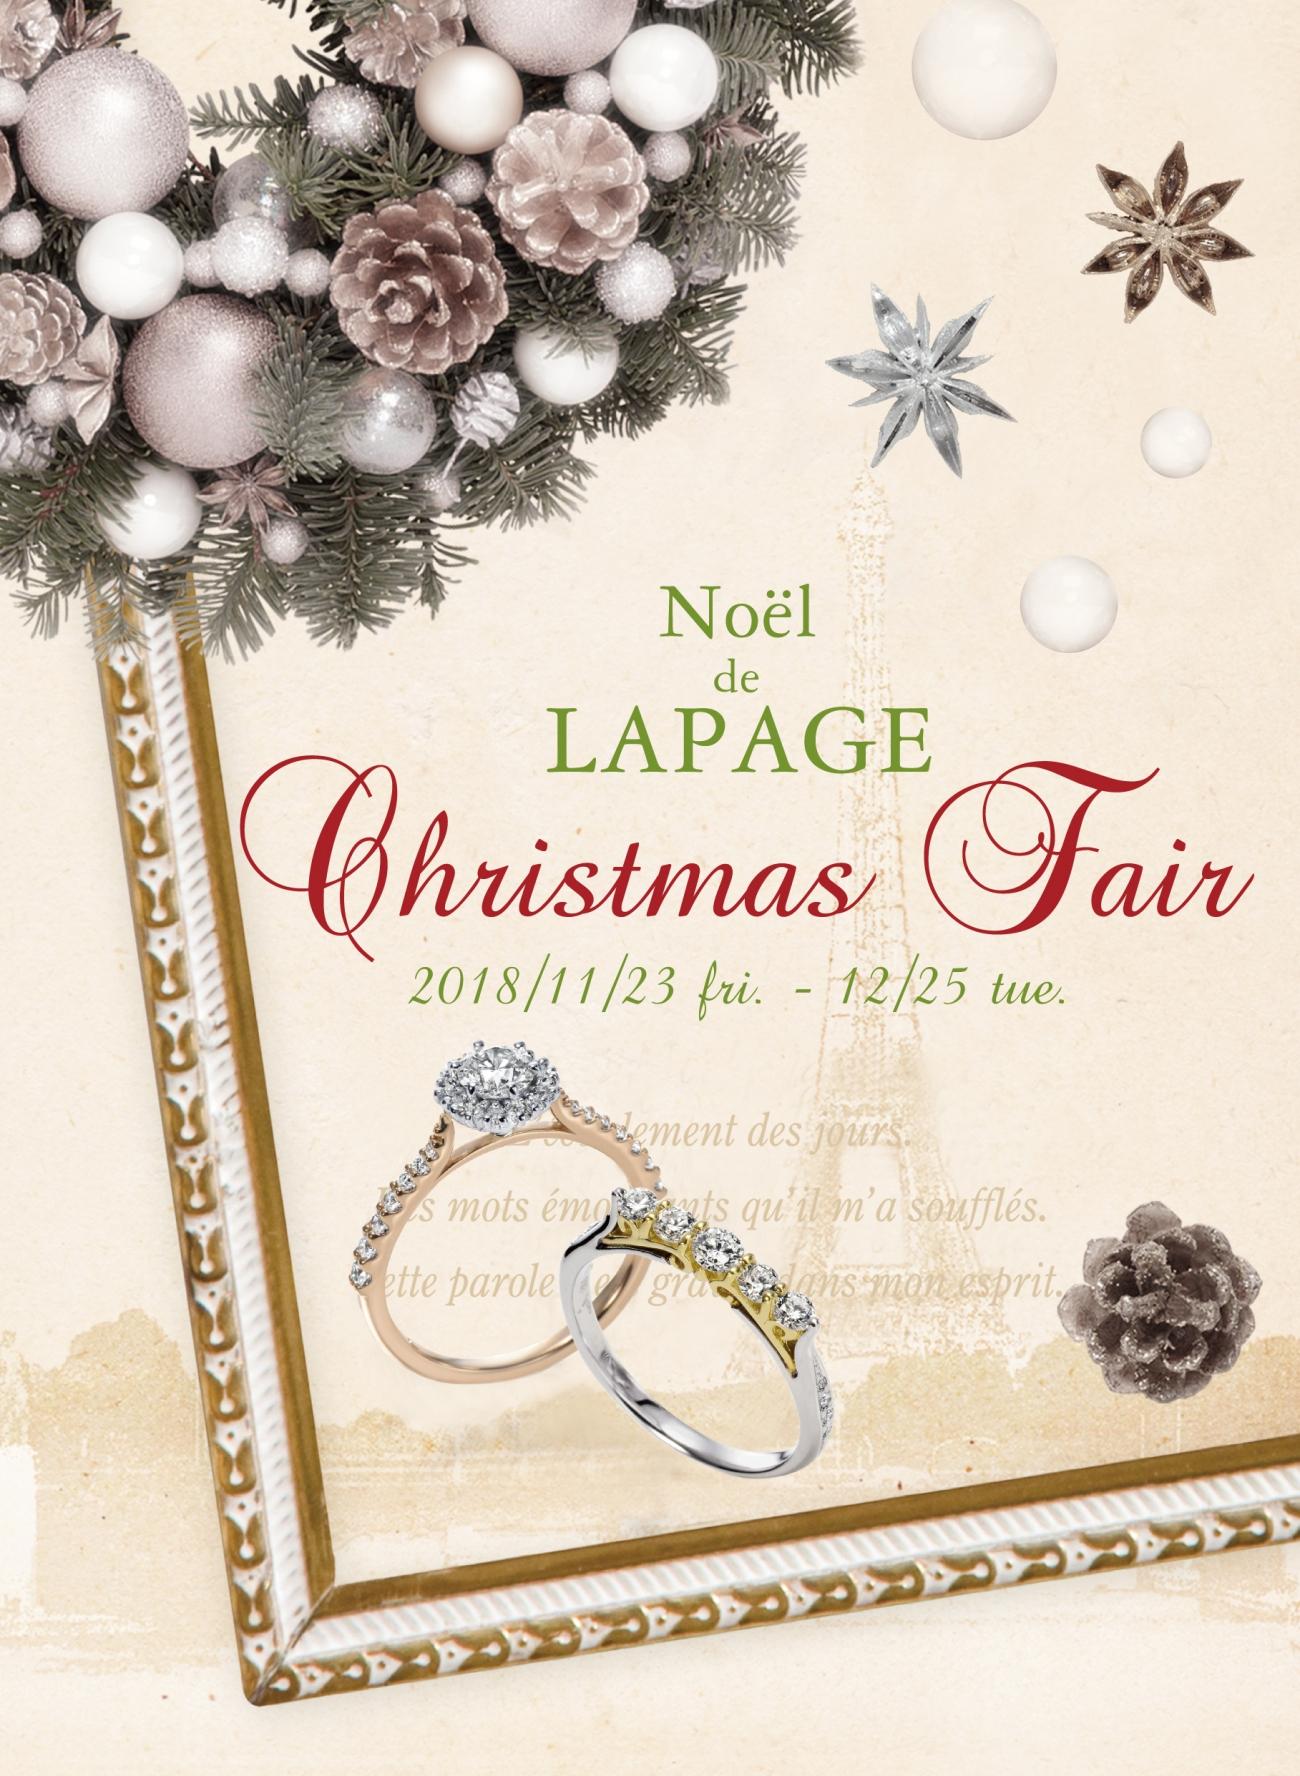 Noel de LAPAGE Christmas Fair